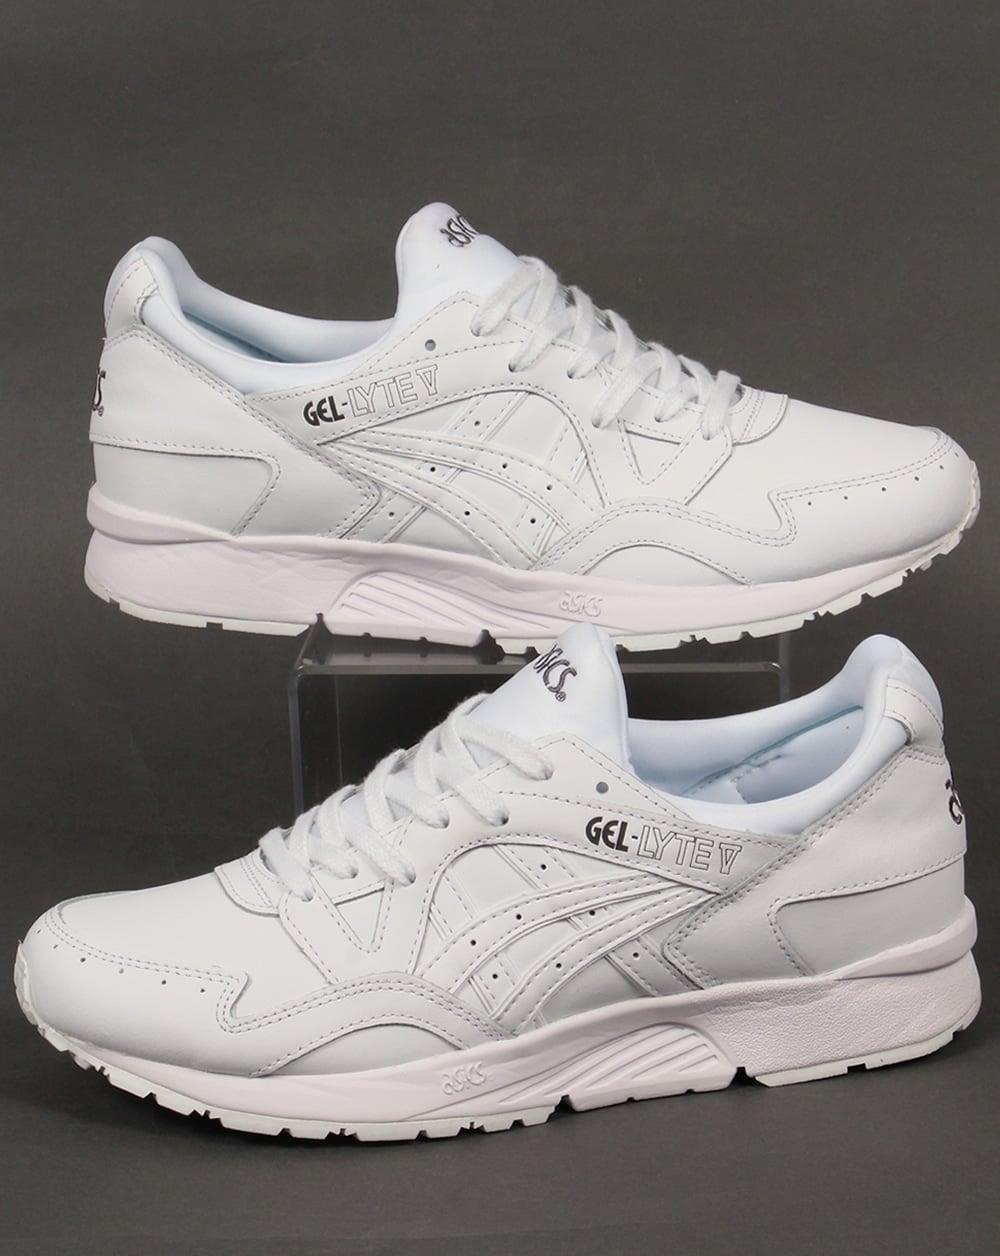 Asics Gel Lyte V Leather Trainers White